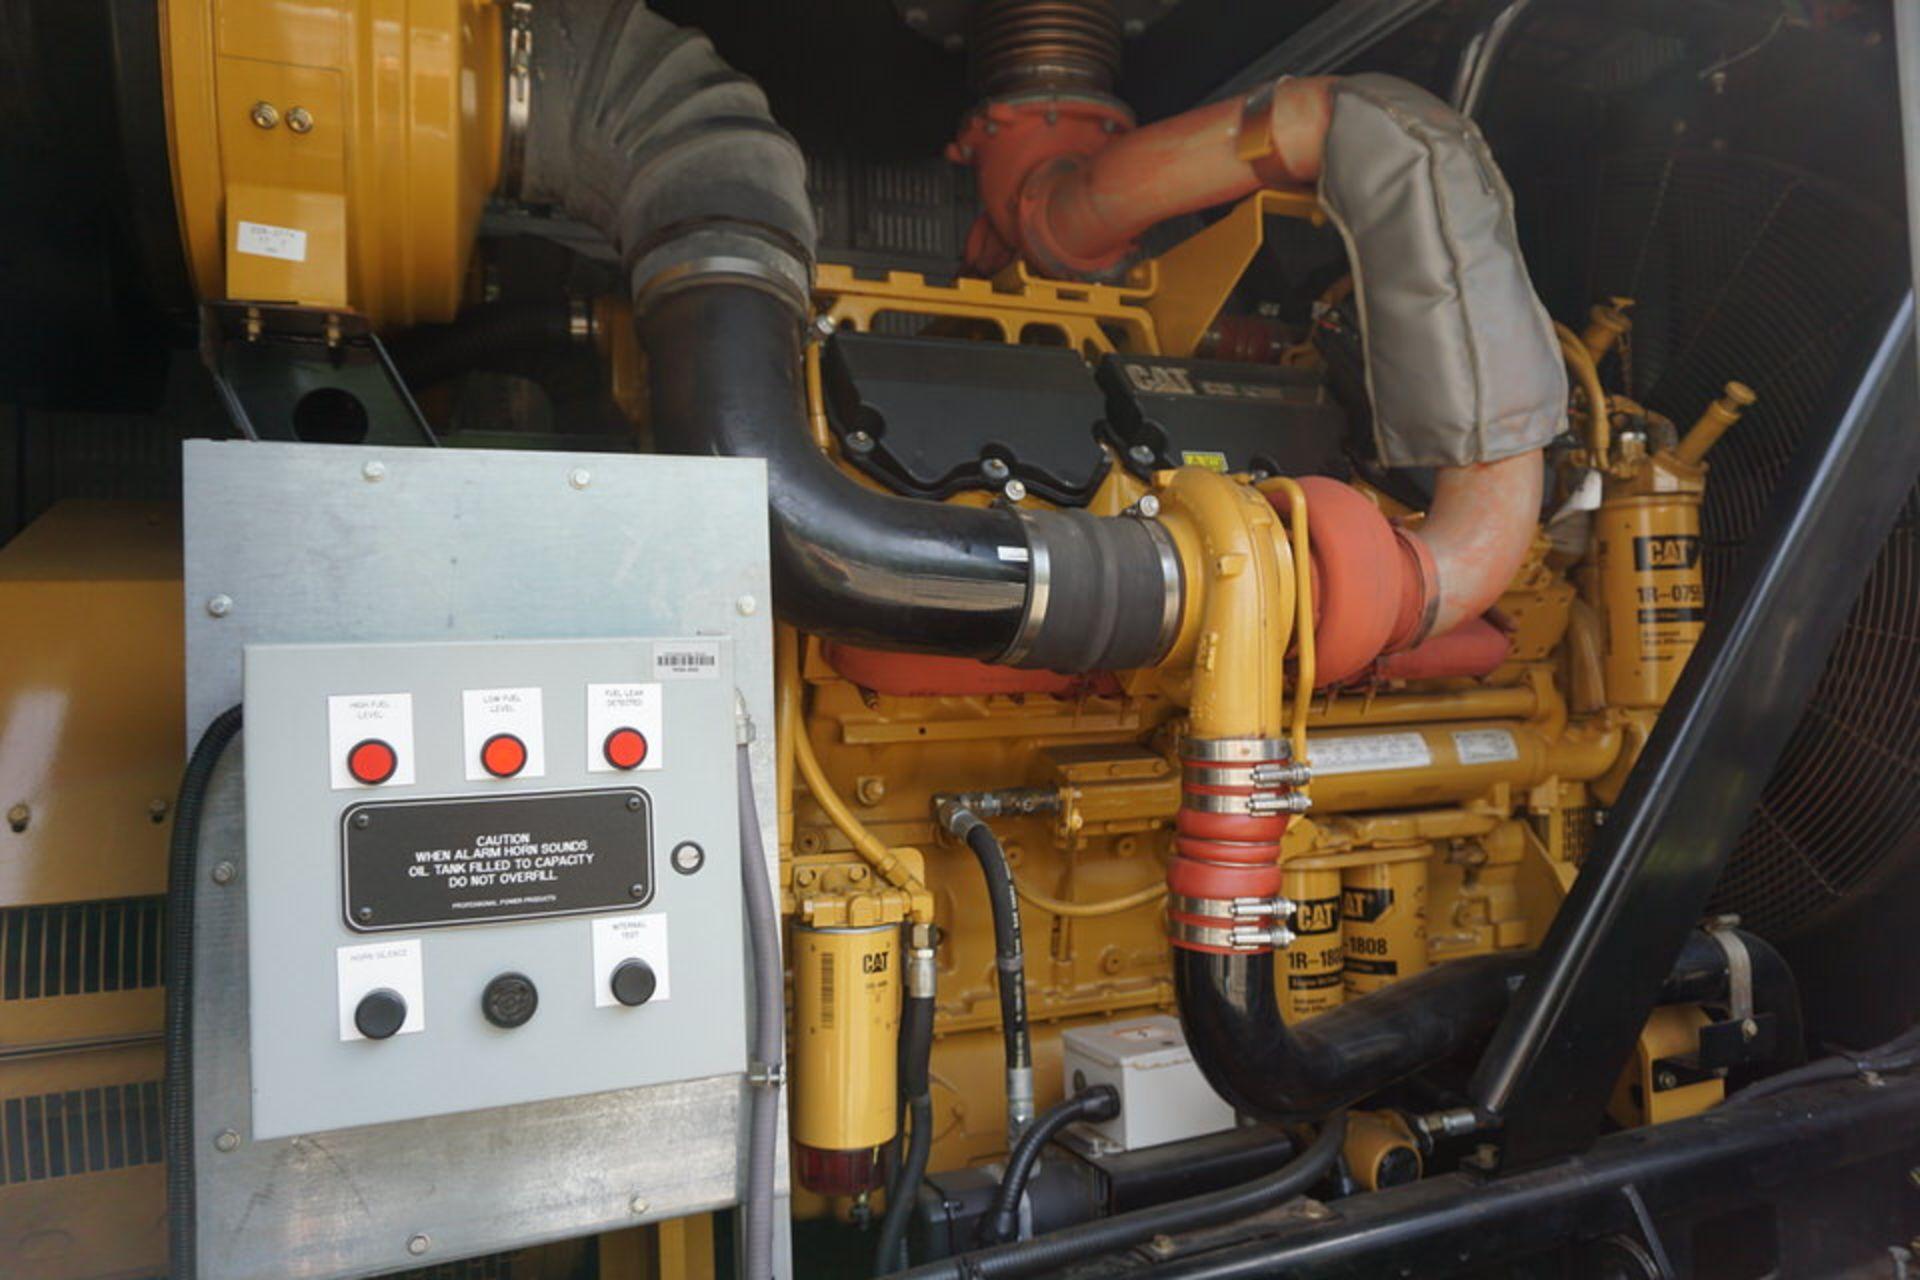 2007 CATERPILLAR BACK UP GENERATOR, ENGINE MODEL: C32 W/ EMCP3.3 CONTROL, 173.9 HOURS, 1250 KVA - Image 21 of 25